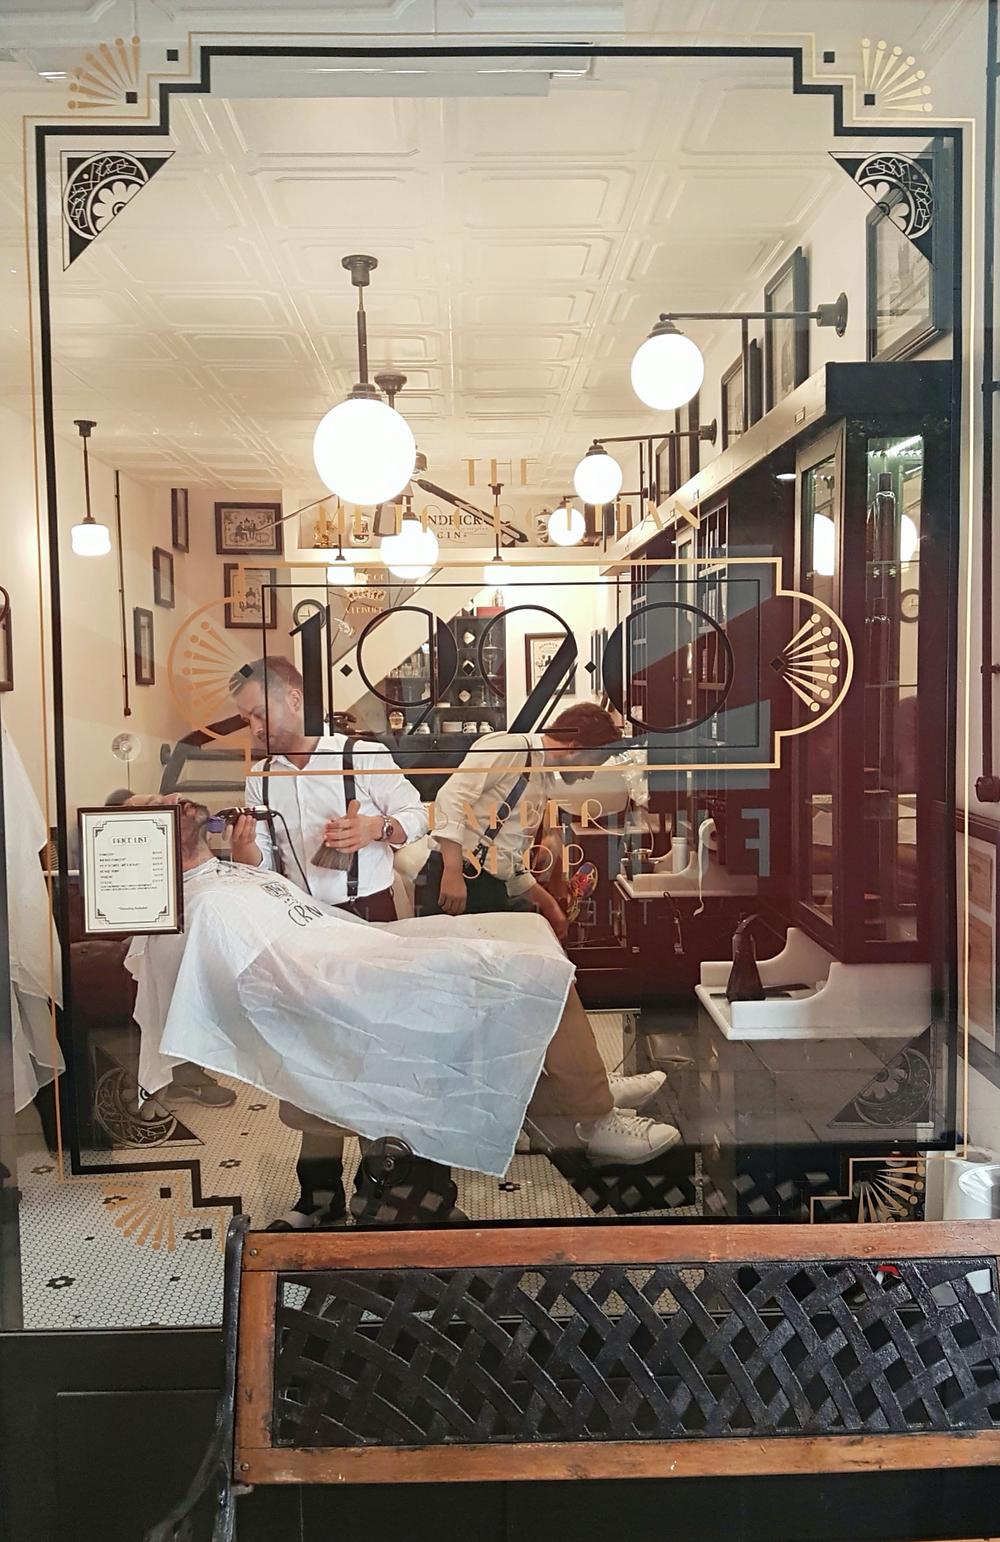 1920 The Metropolitan Barbershop